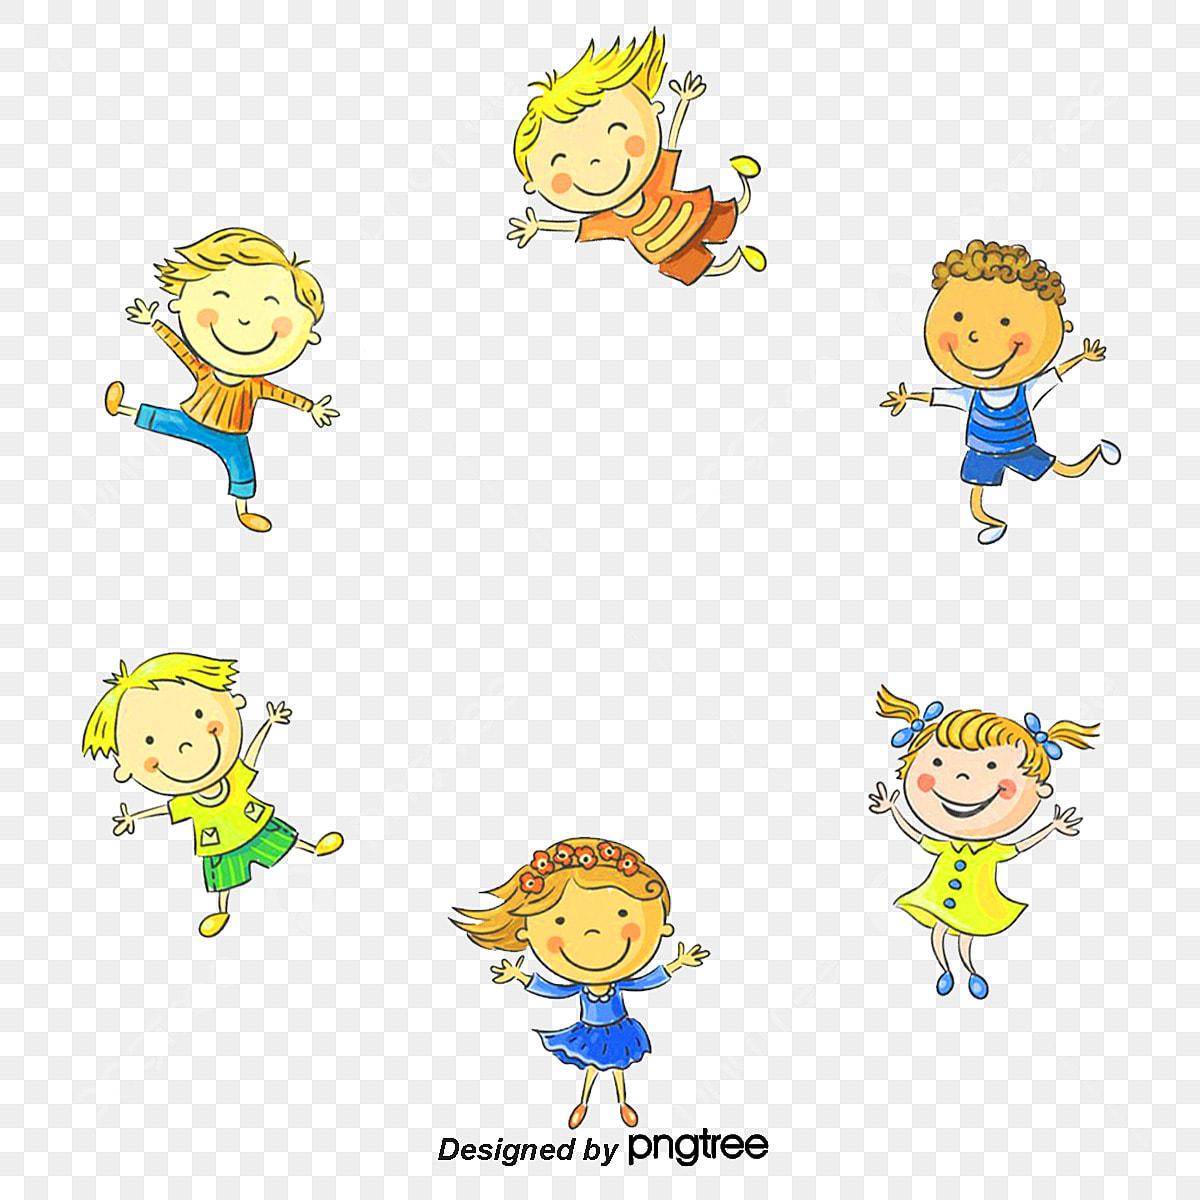 Vector illustration of happy children's day.